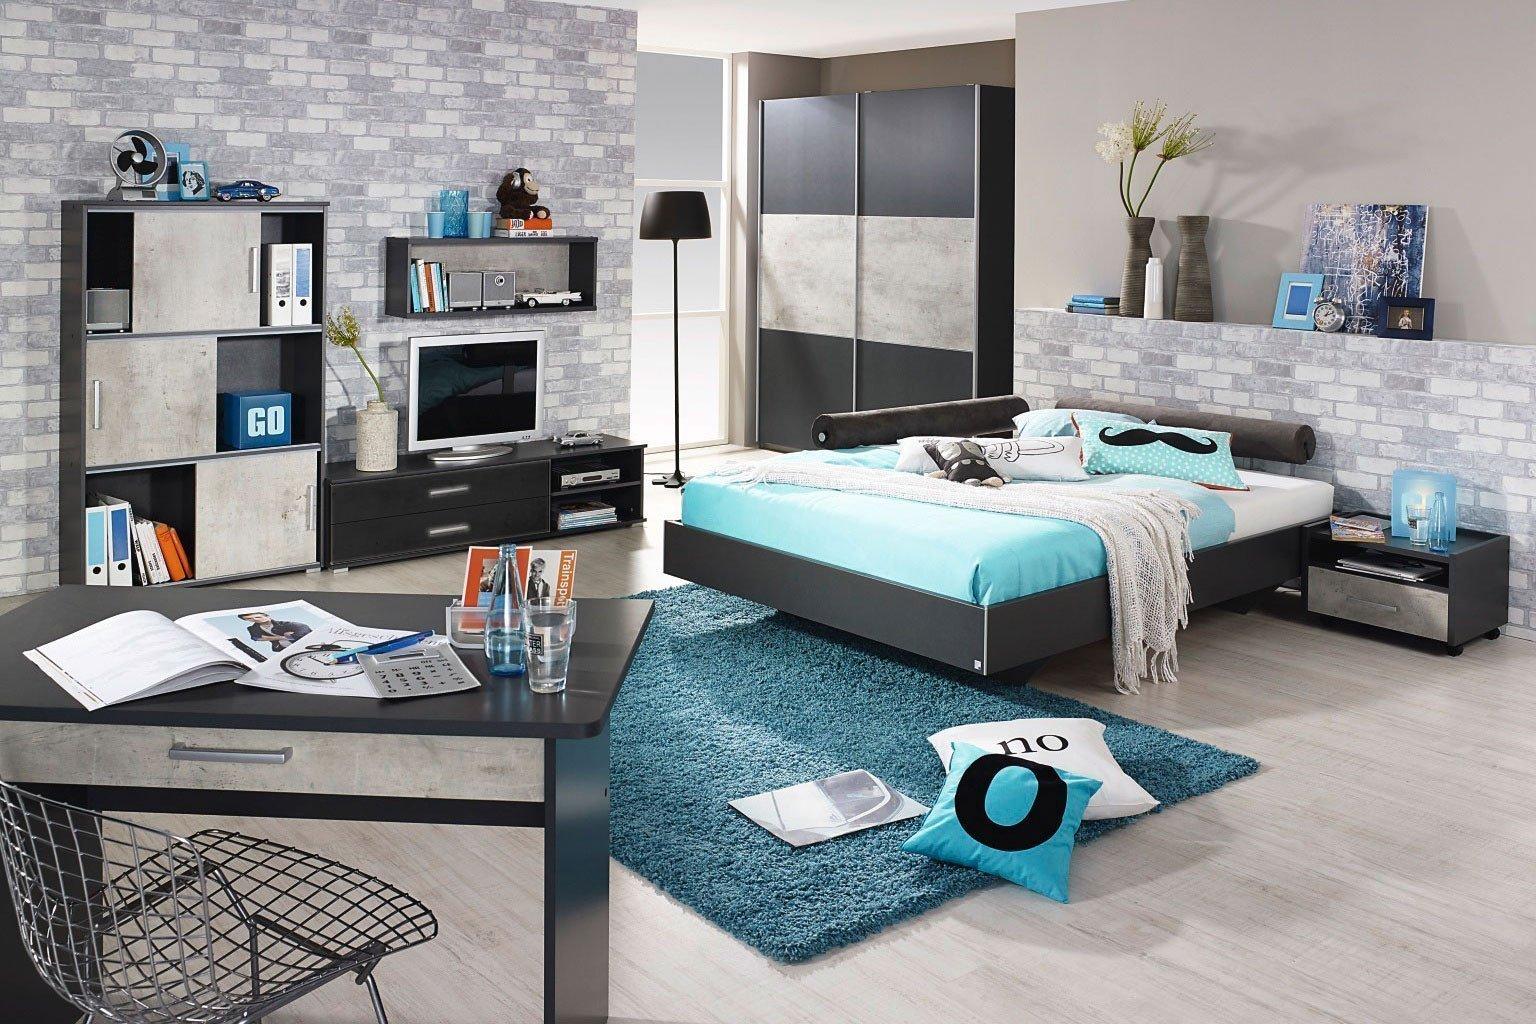 rauch mailo jugendm bel grau stone grey m bel letz ihr online shop. Black Bedroom Furniture Sets. Home Design Ideas